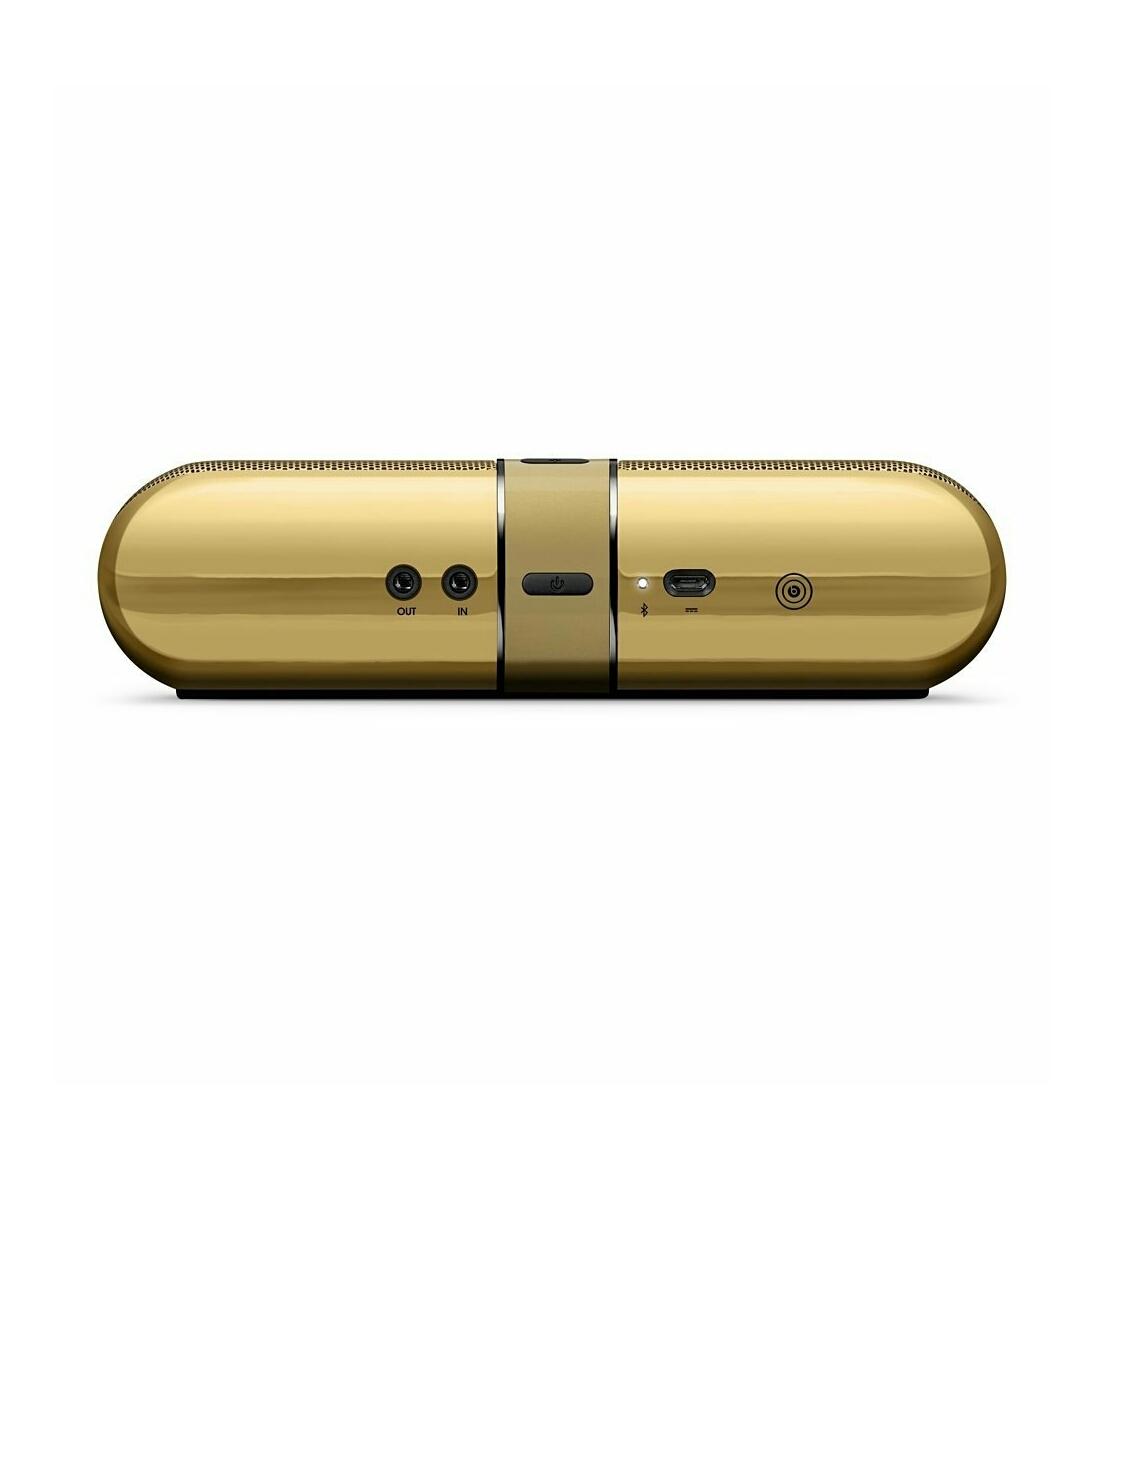 Beats Studio Wireless Gold and Pill 2.0 Portable Bluetooth ...